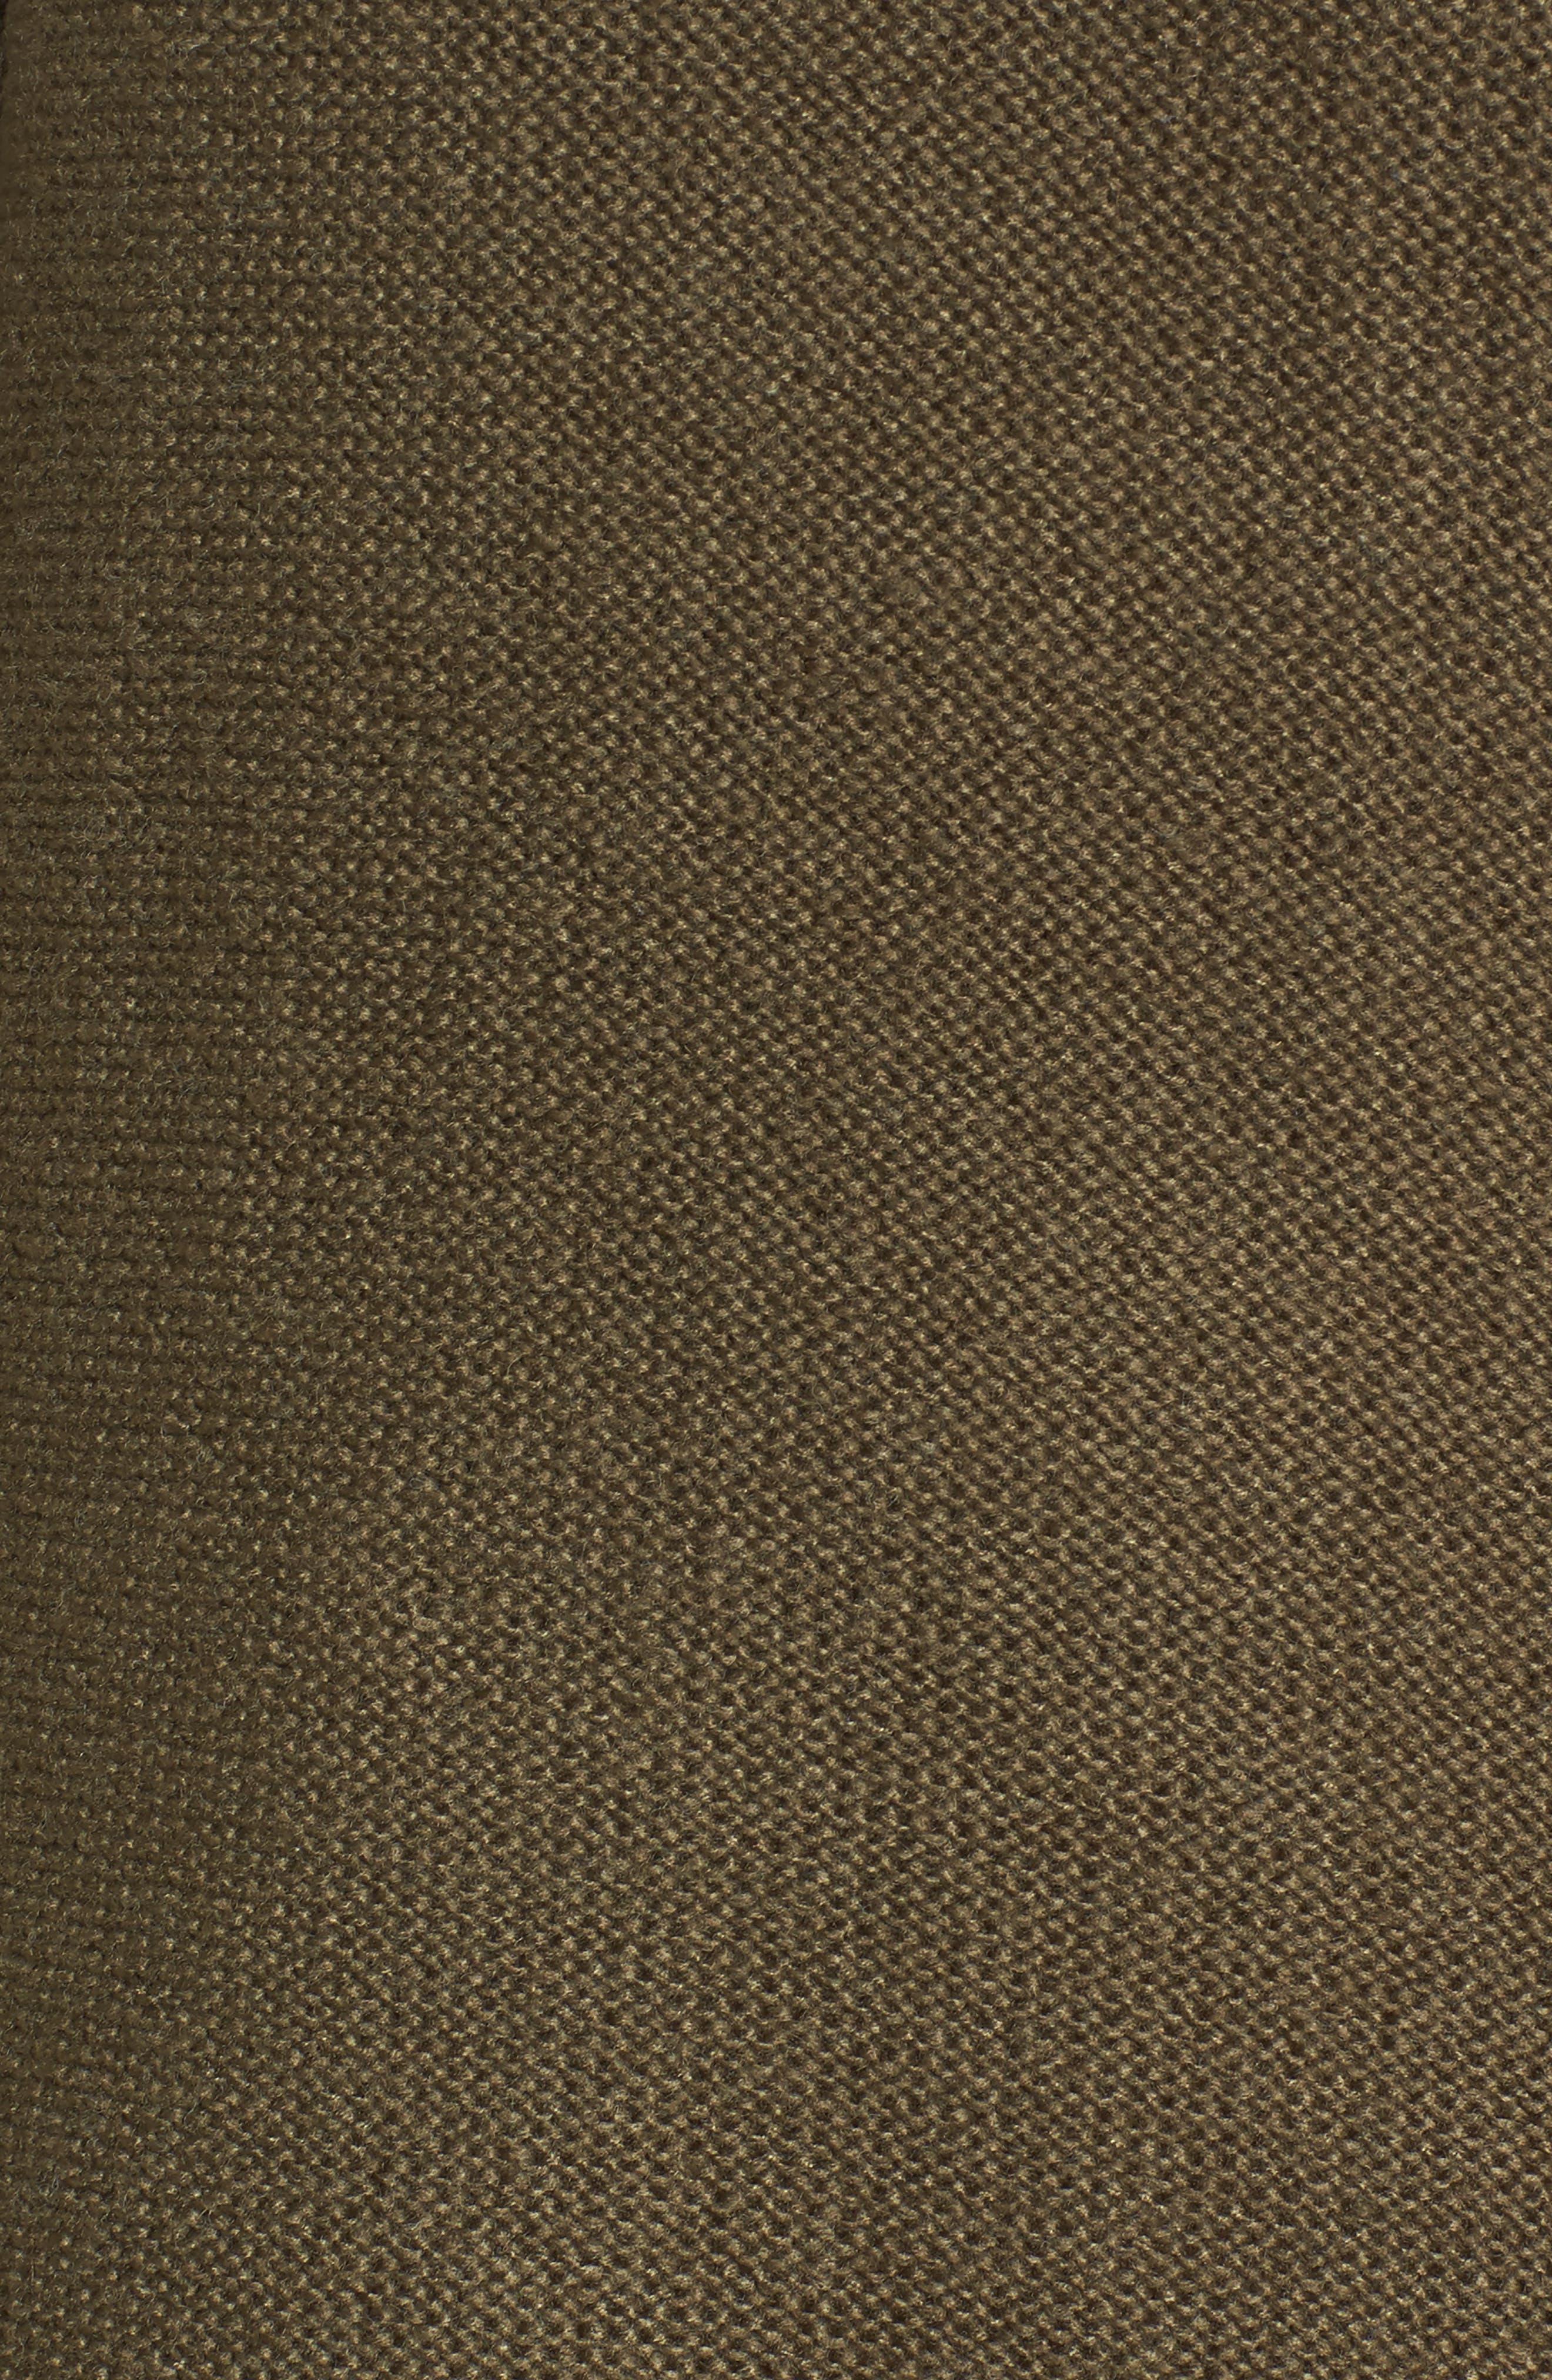 Bell Sleeve Sweater Dress,                             Alternate thumbnail 10, color,